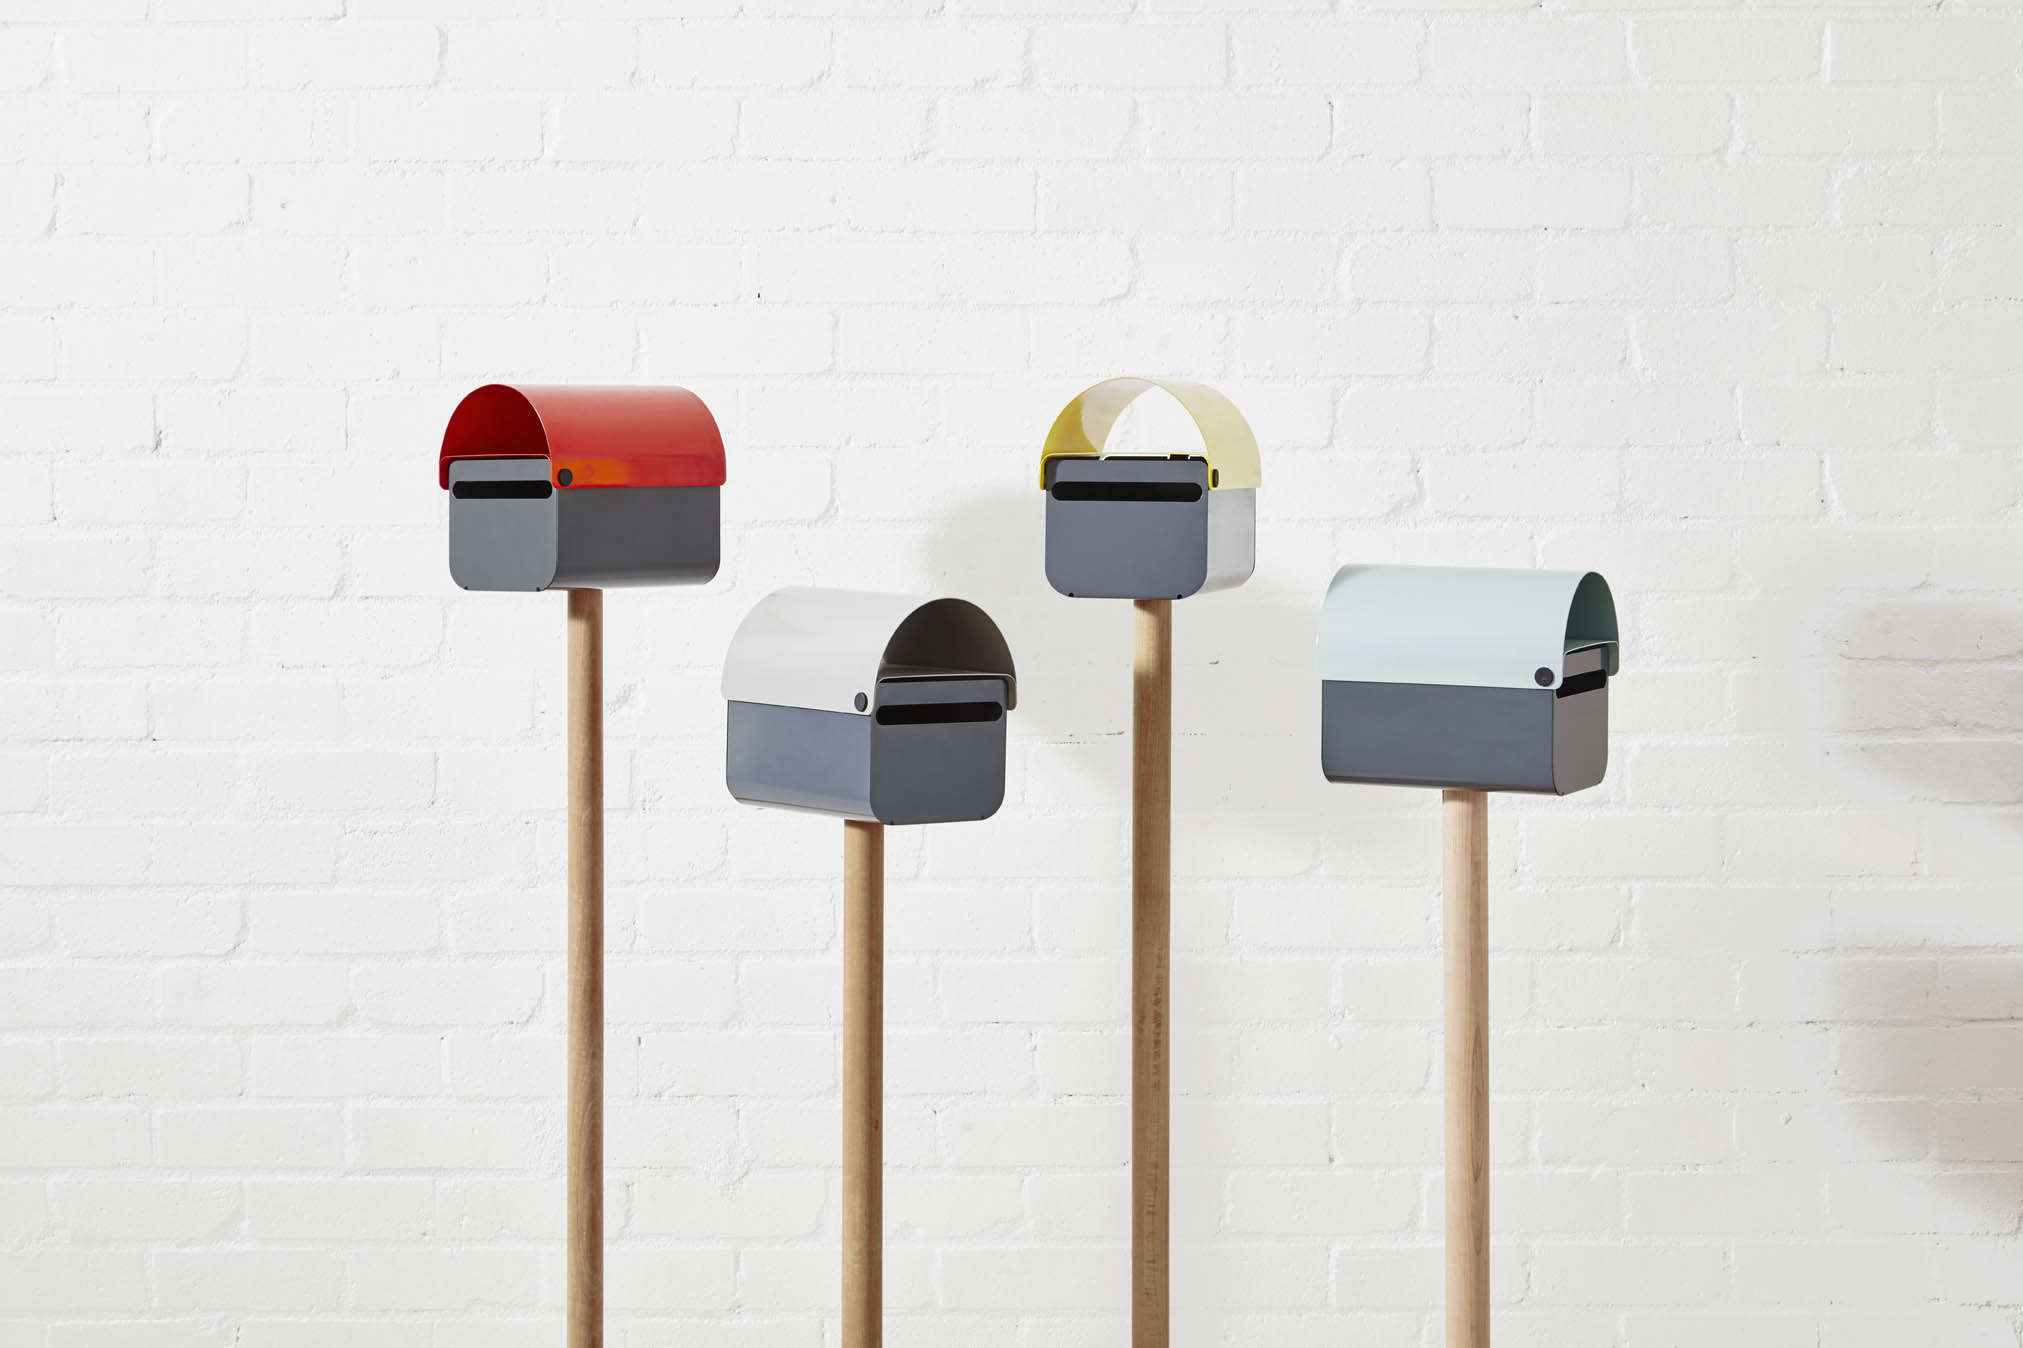 tomtom-lockable-letterbox-mailbox-four-colors